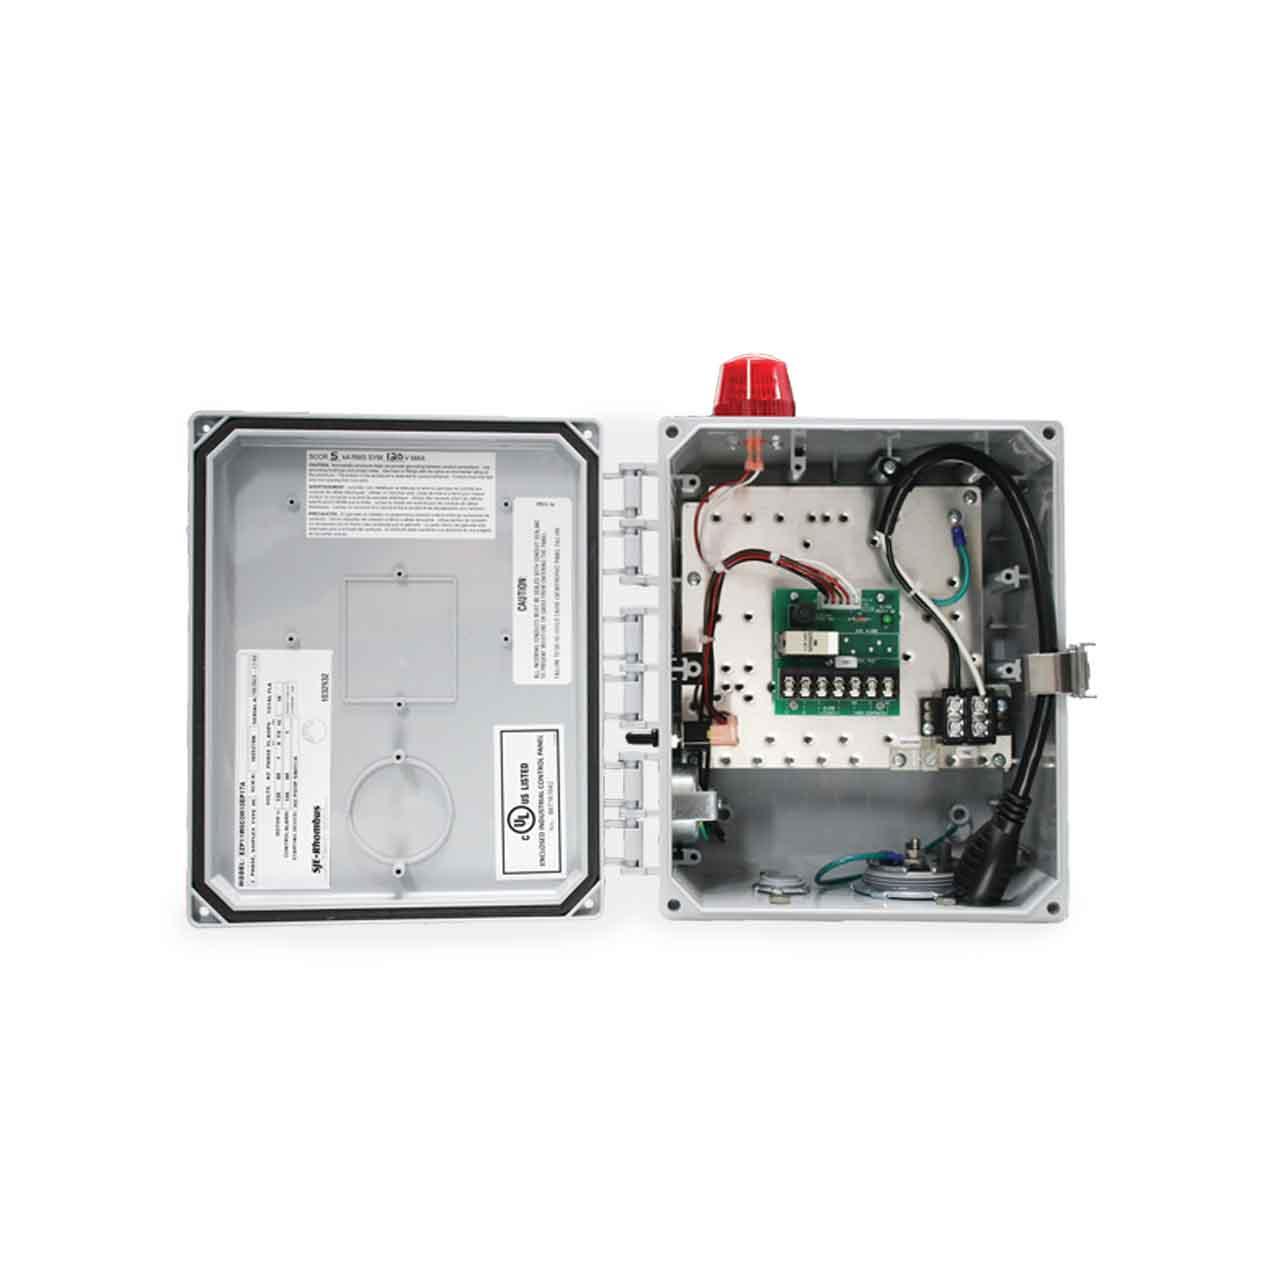 sje rhombus sje rhombus ezp series plugger plug in pump control rhombus septic control wiring diagram [ 1280 x 1280 Pixel ]